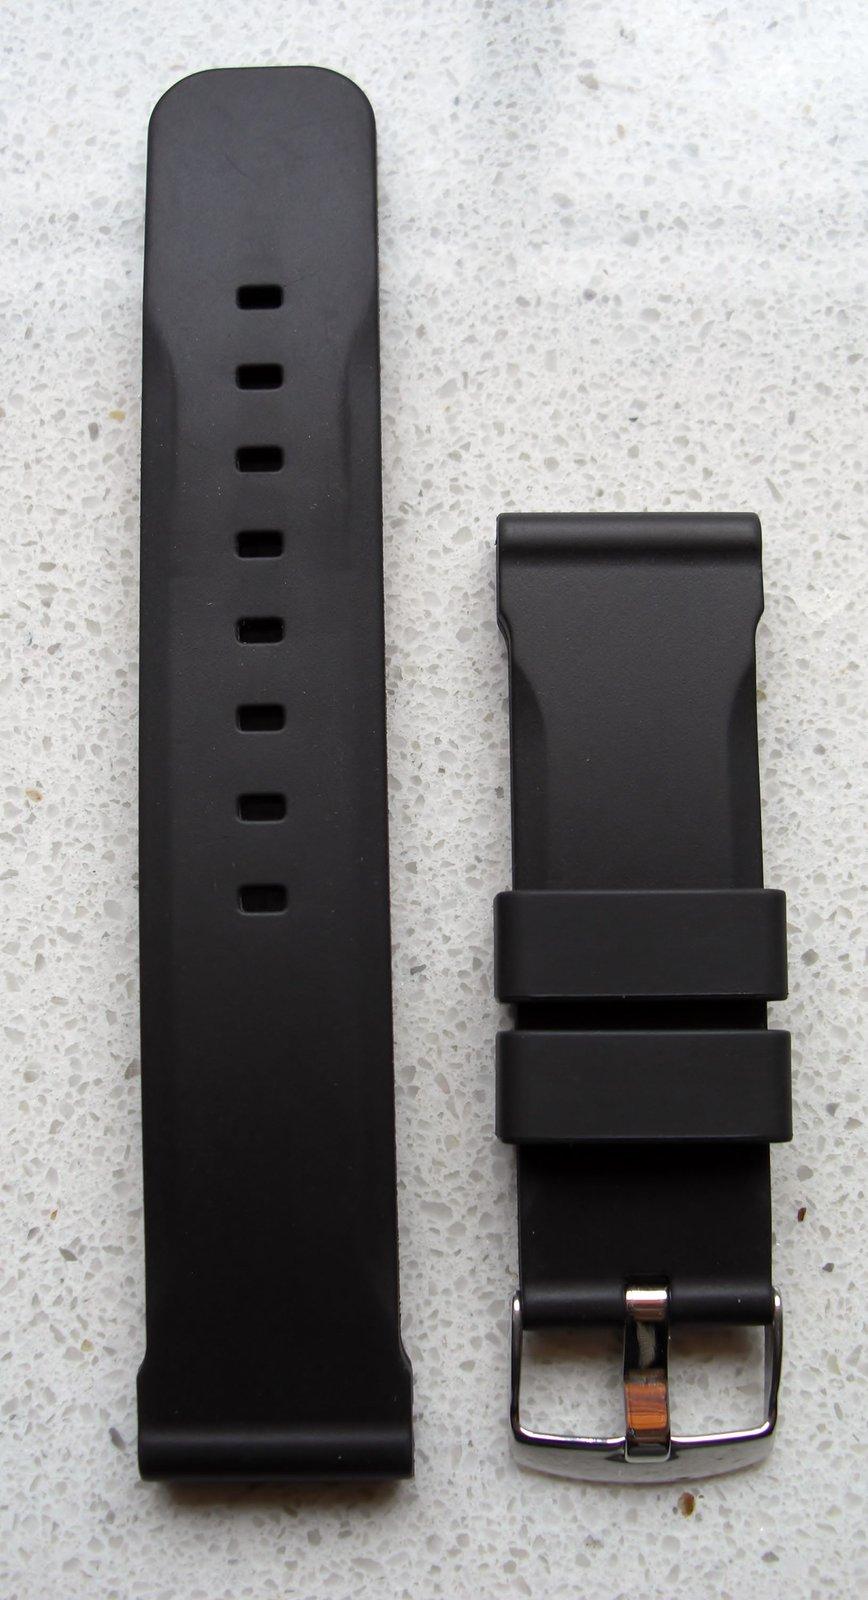 reserviert silikon kautschukband sehr massiv 24 22mm neu uhrforum. Black Bedroom Furniture Sets. Home Design Ideas